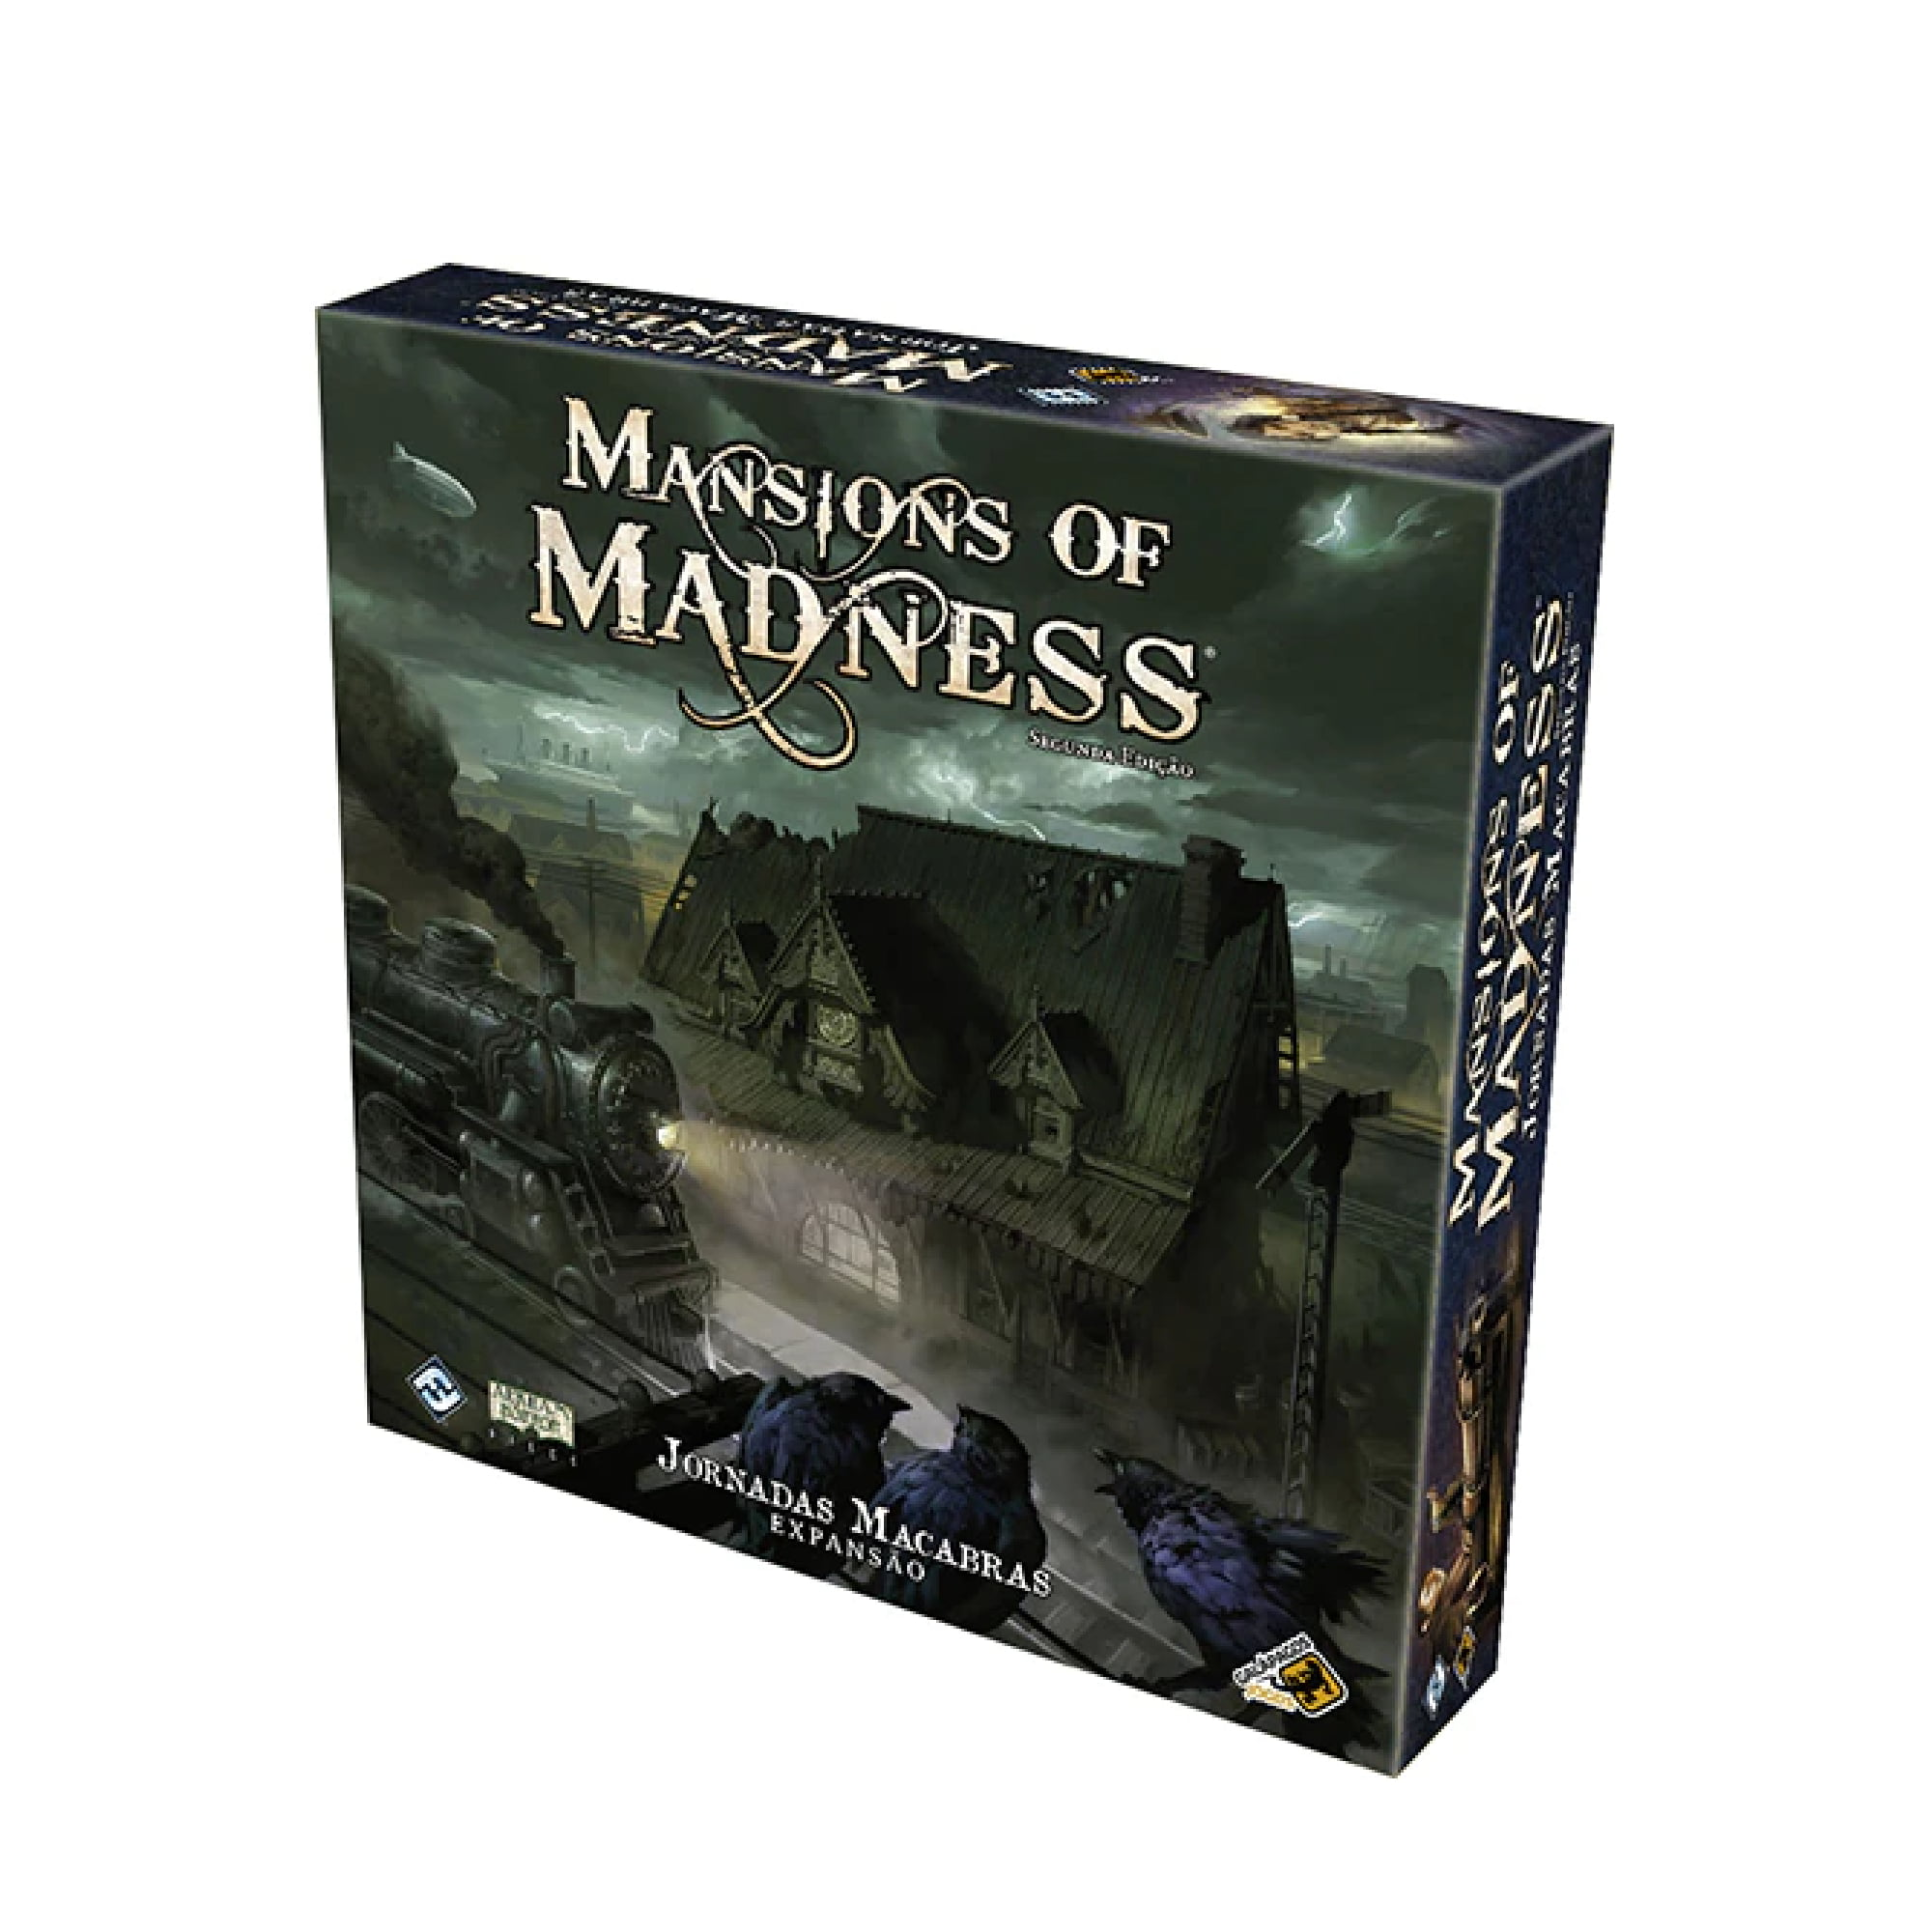 Mansions of Madness: Jornadas Macabras